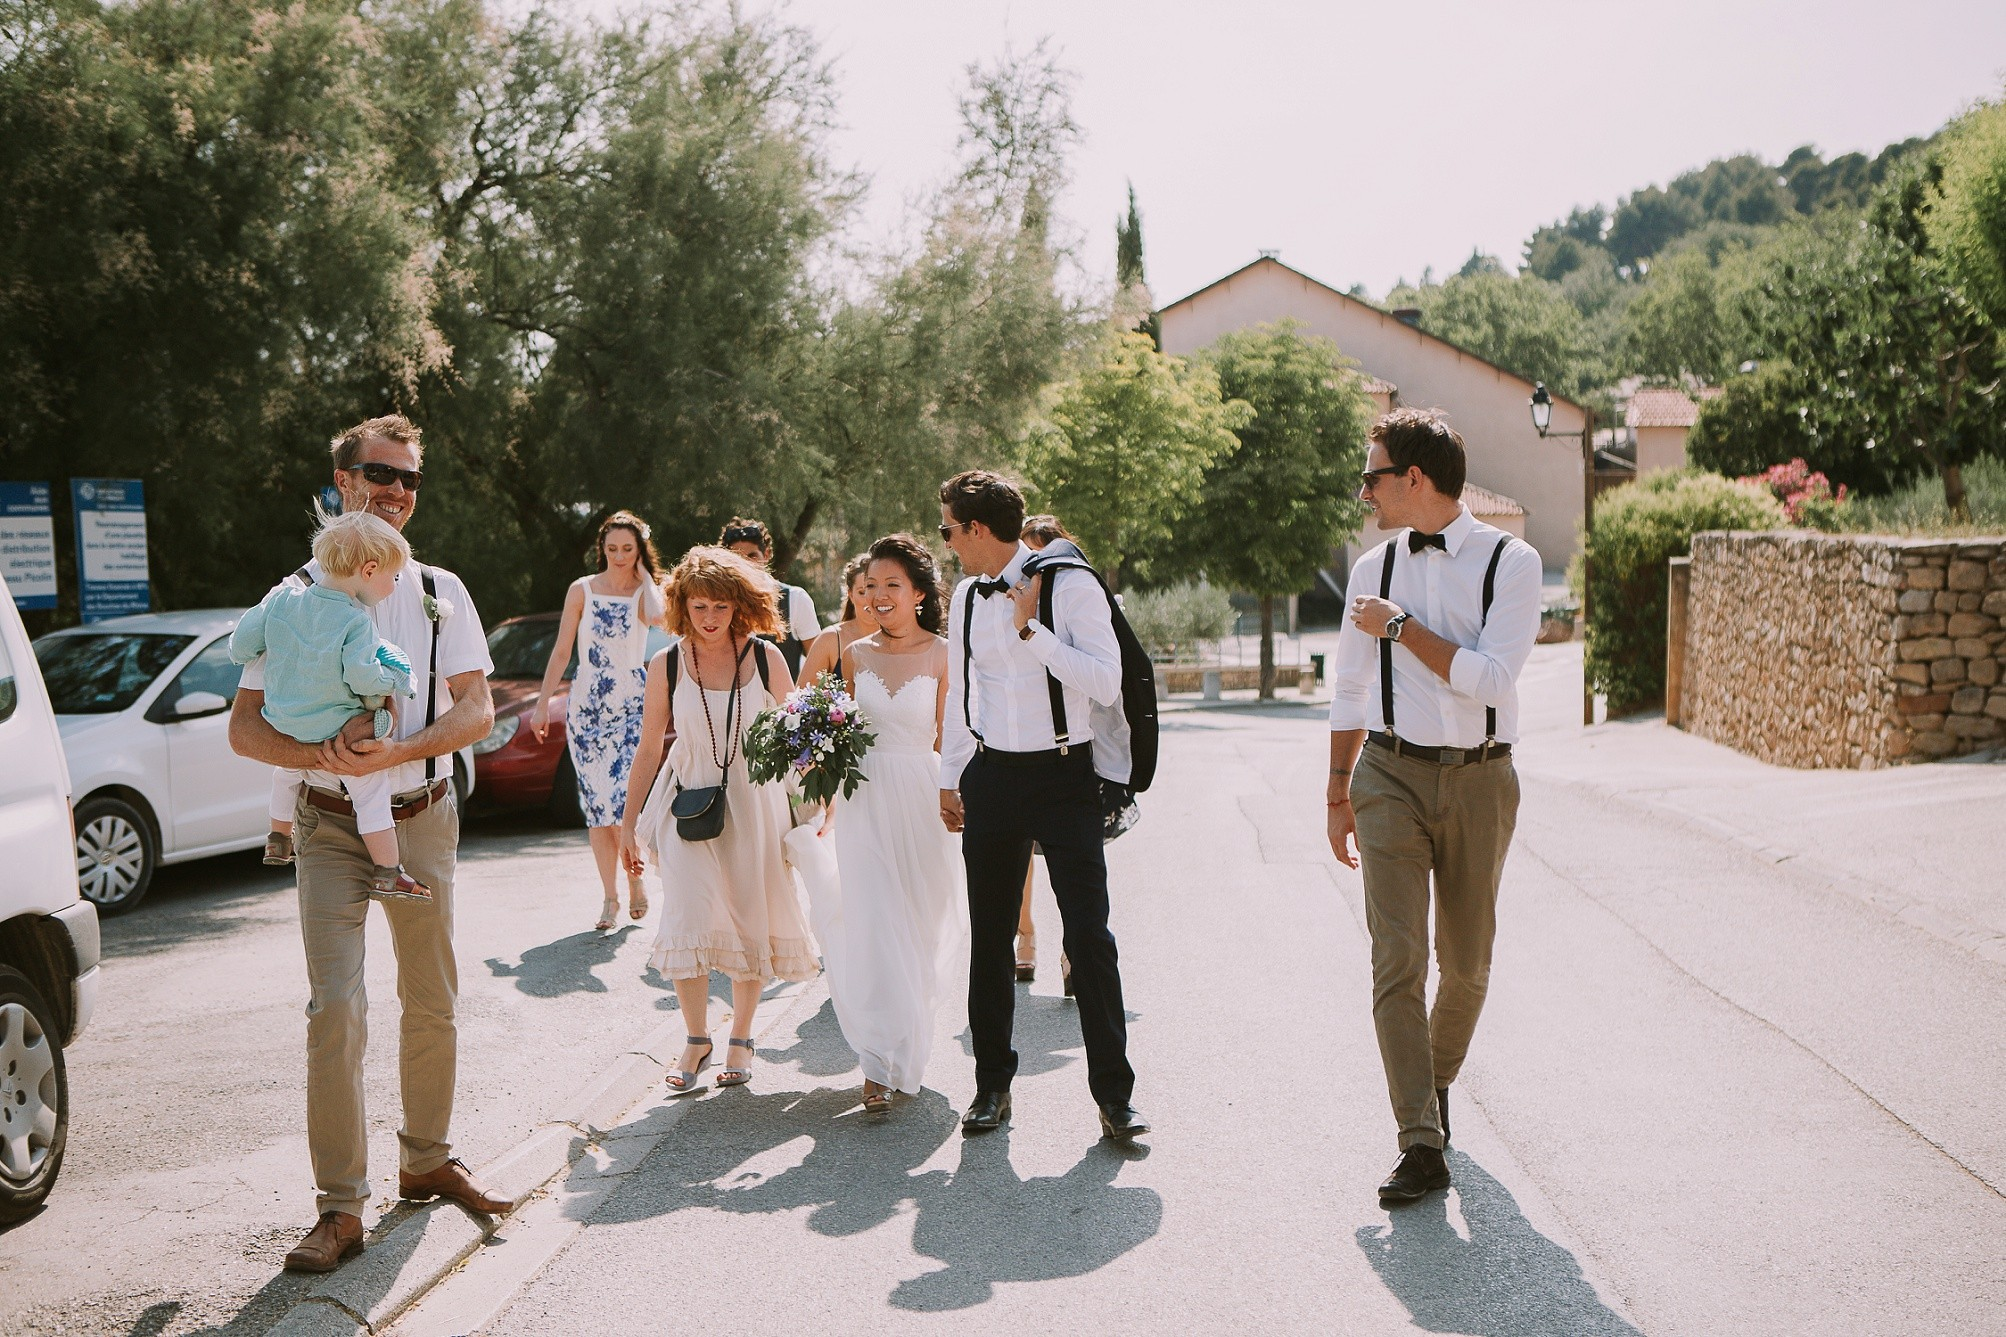 katerynaphotos-mariage-photographe-puyloubier-provence-aix-en-provence-sud-de-la-france_0369.jpg